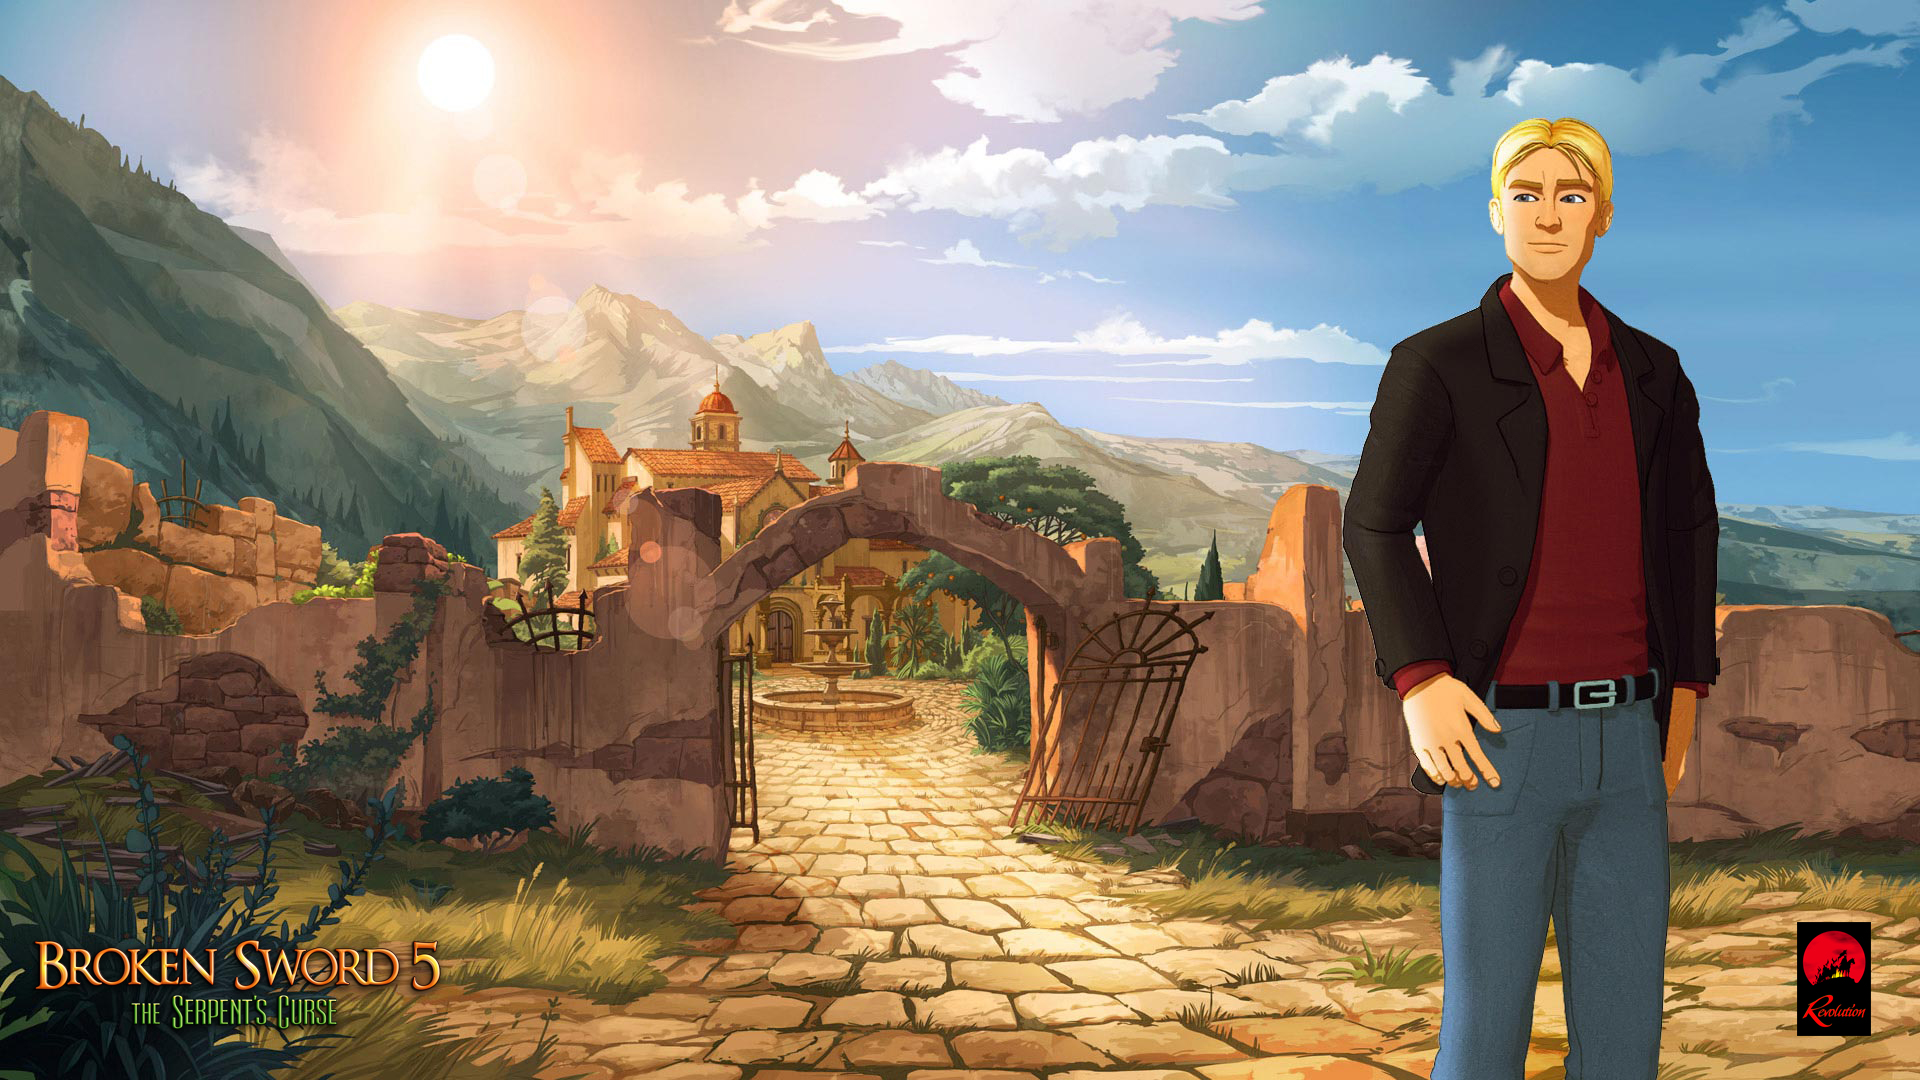 Broken Sword 5 The Serpent's Curse Image 1